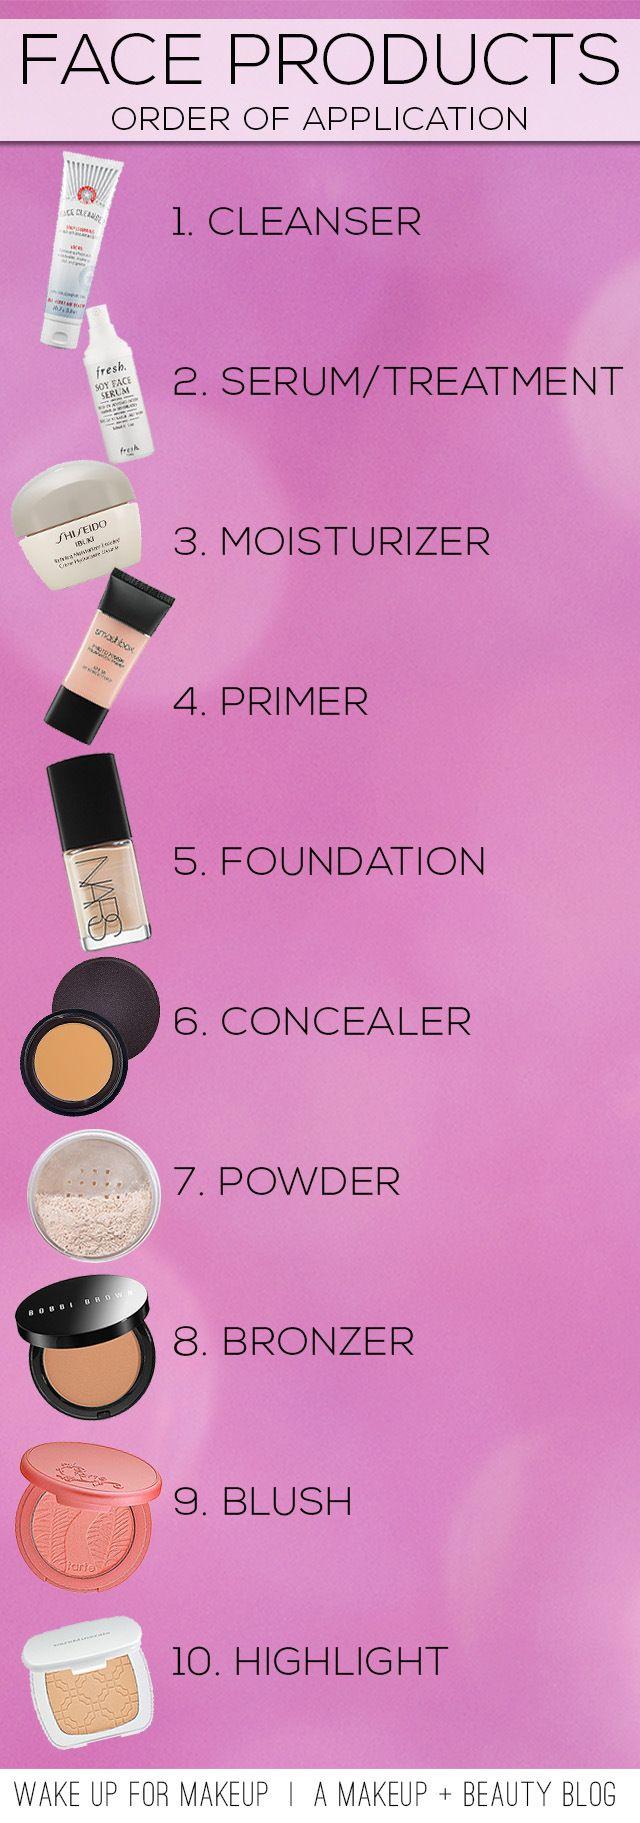 does mac do free makeup application